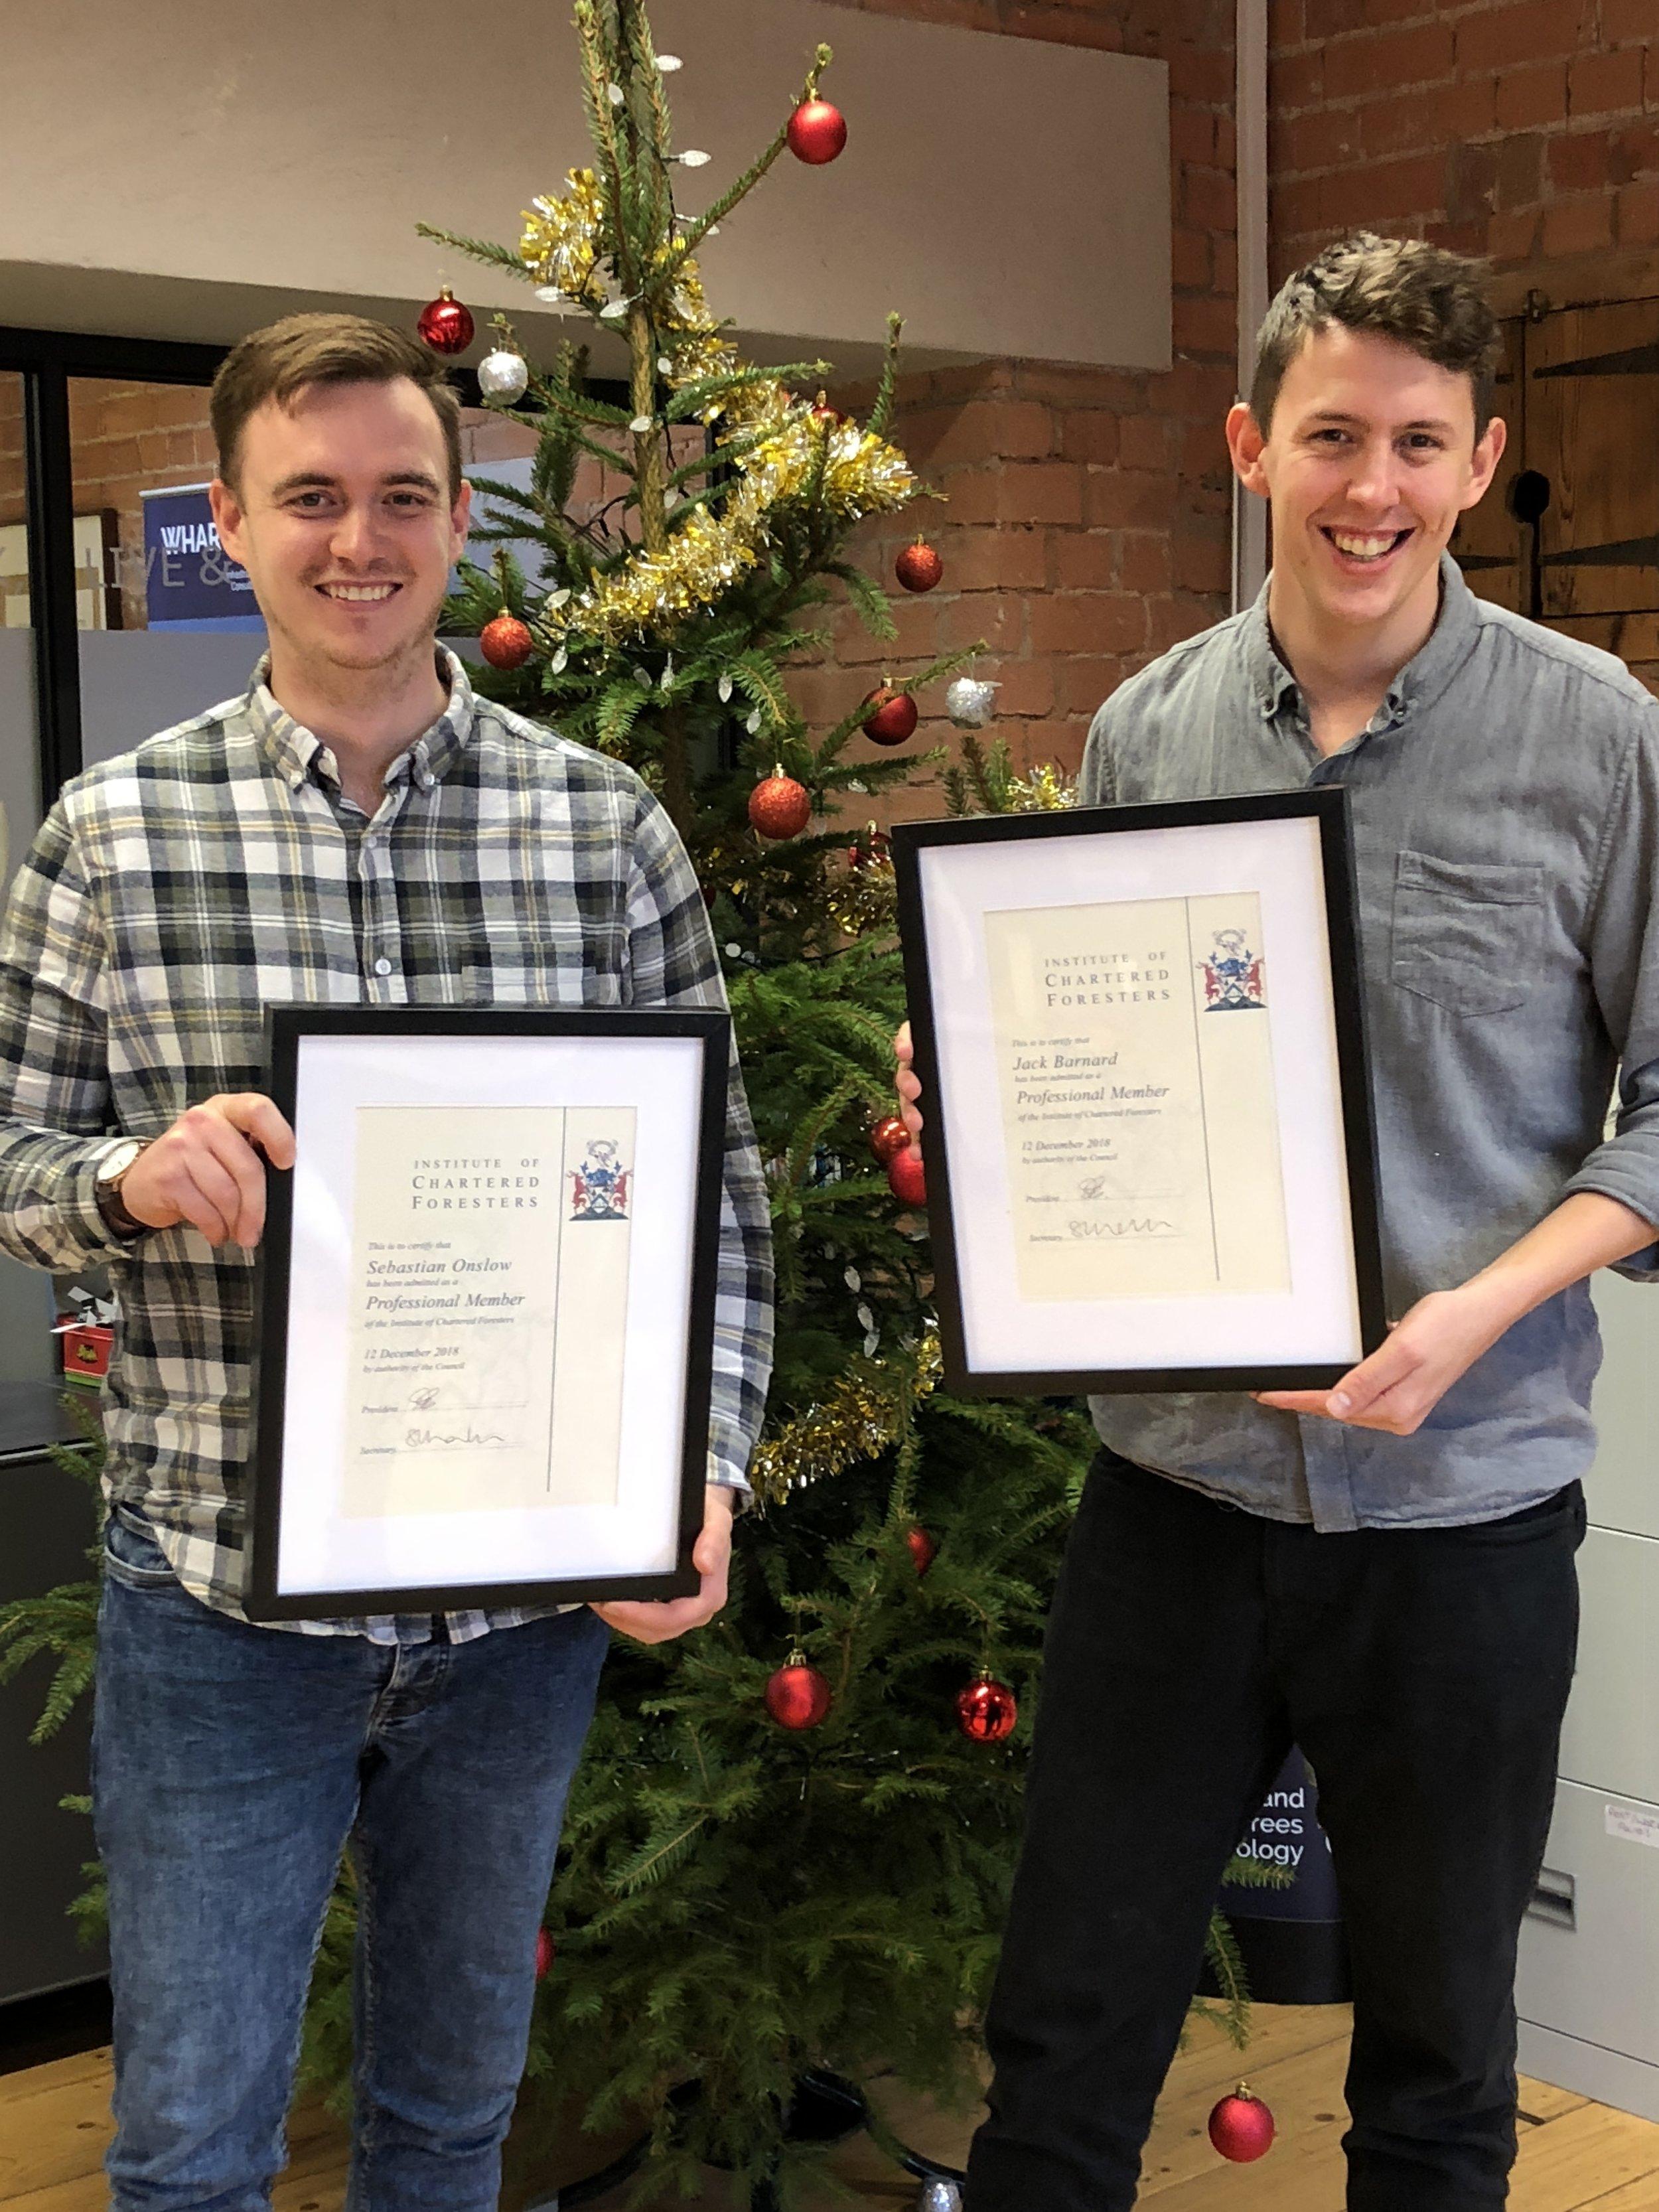 Congratulations Sebastian Onslow & Jack Barnard